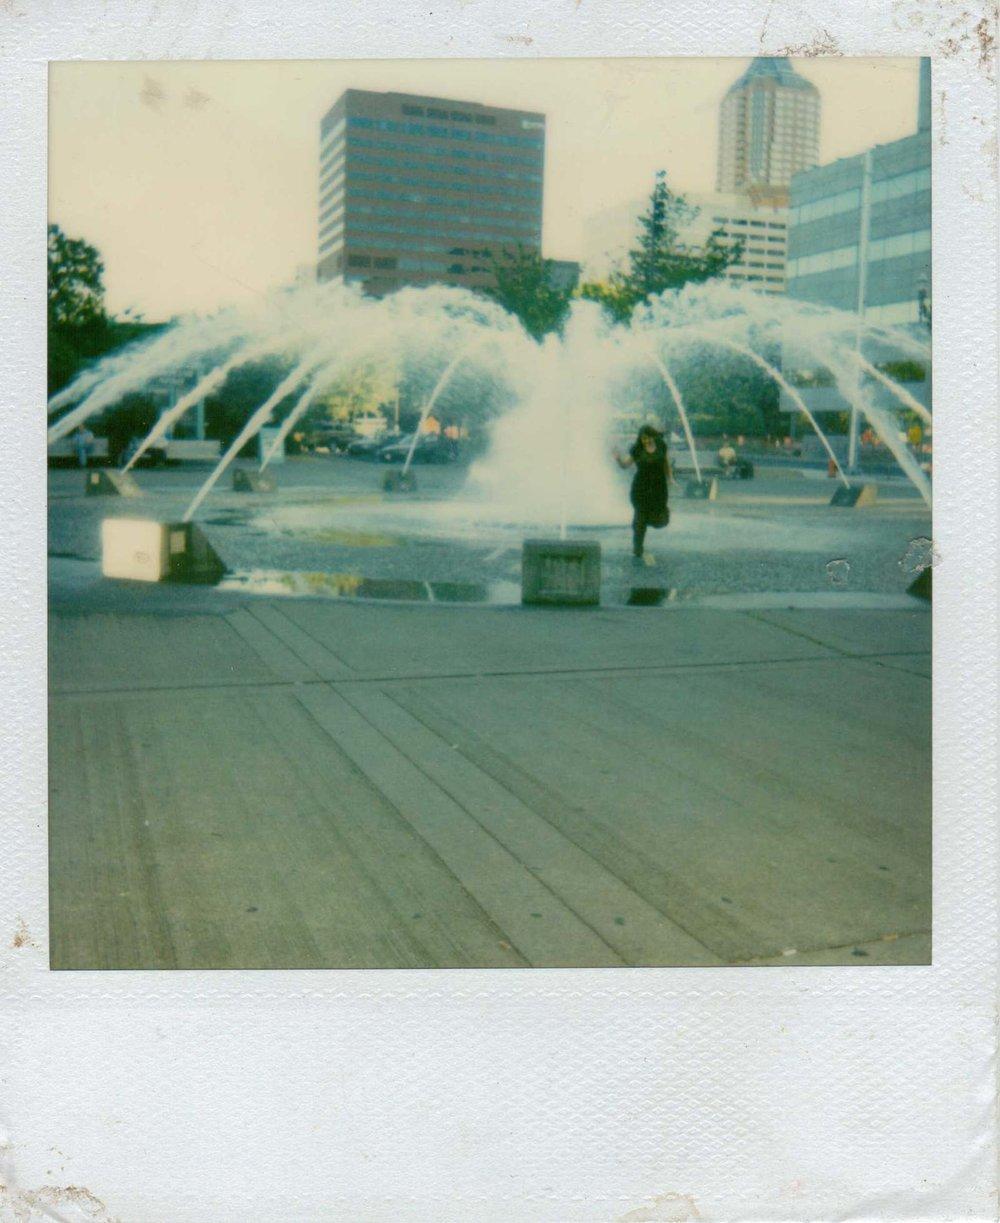 Beth_Polaroid_1600_c.jpg